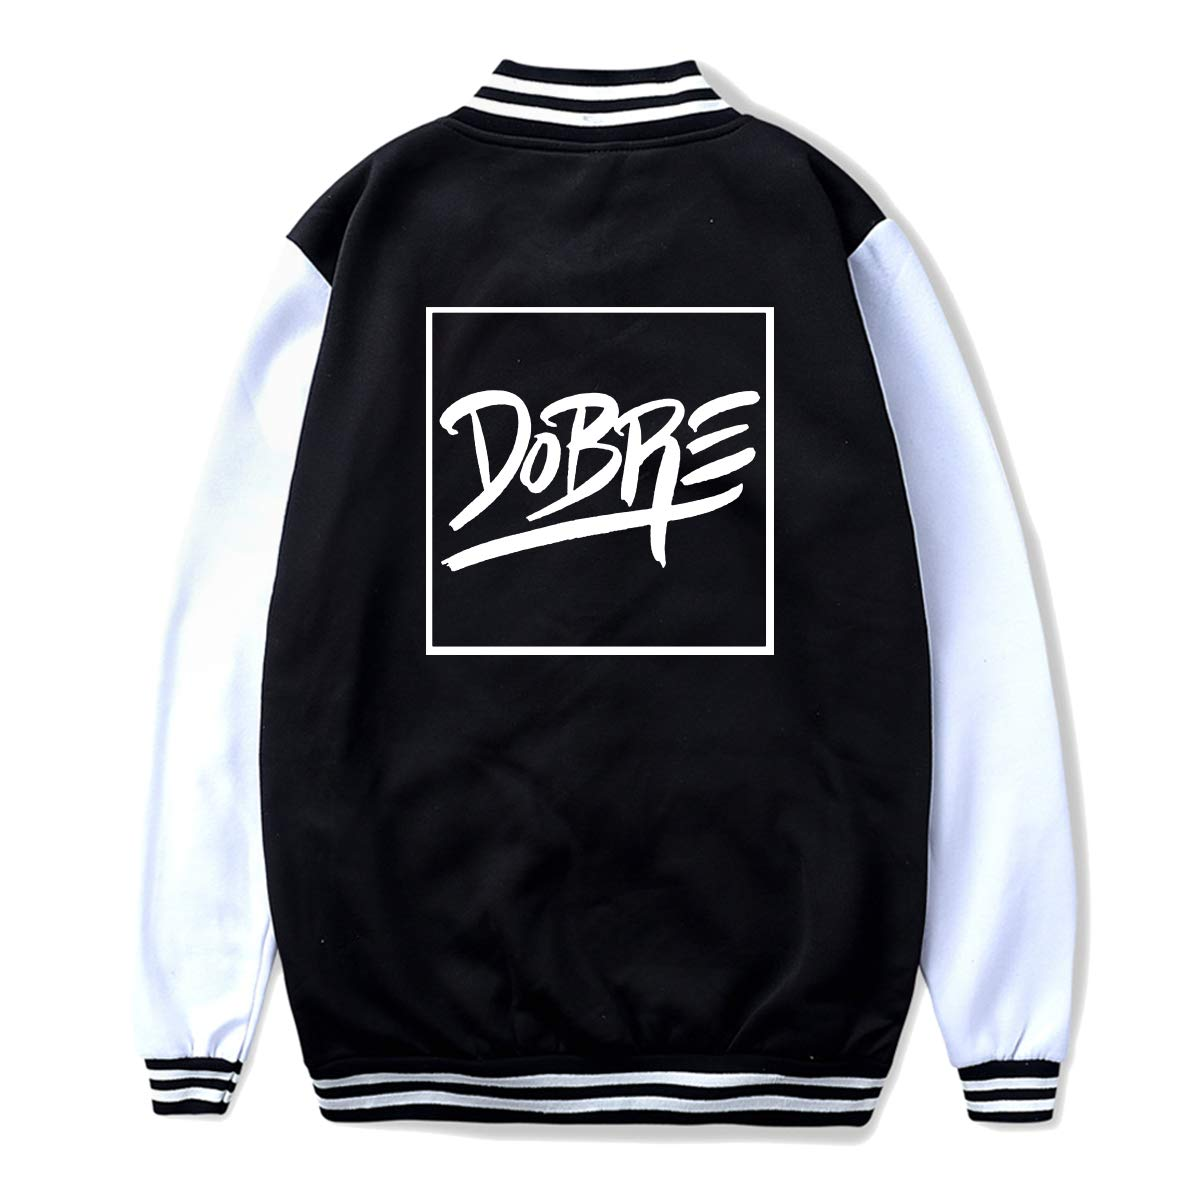 Dobre Brother Logo Teen Boys Girls Youth Teenage Sport Baseball Uniform Jacket Coat Sweater Coat